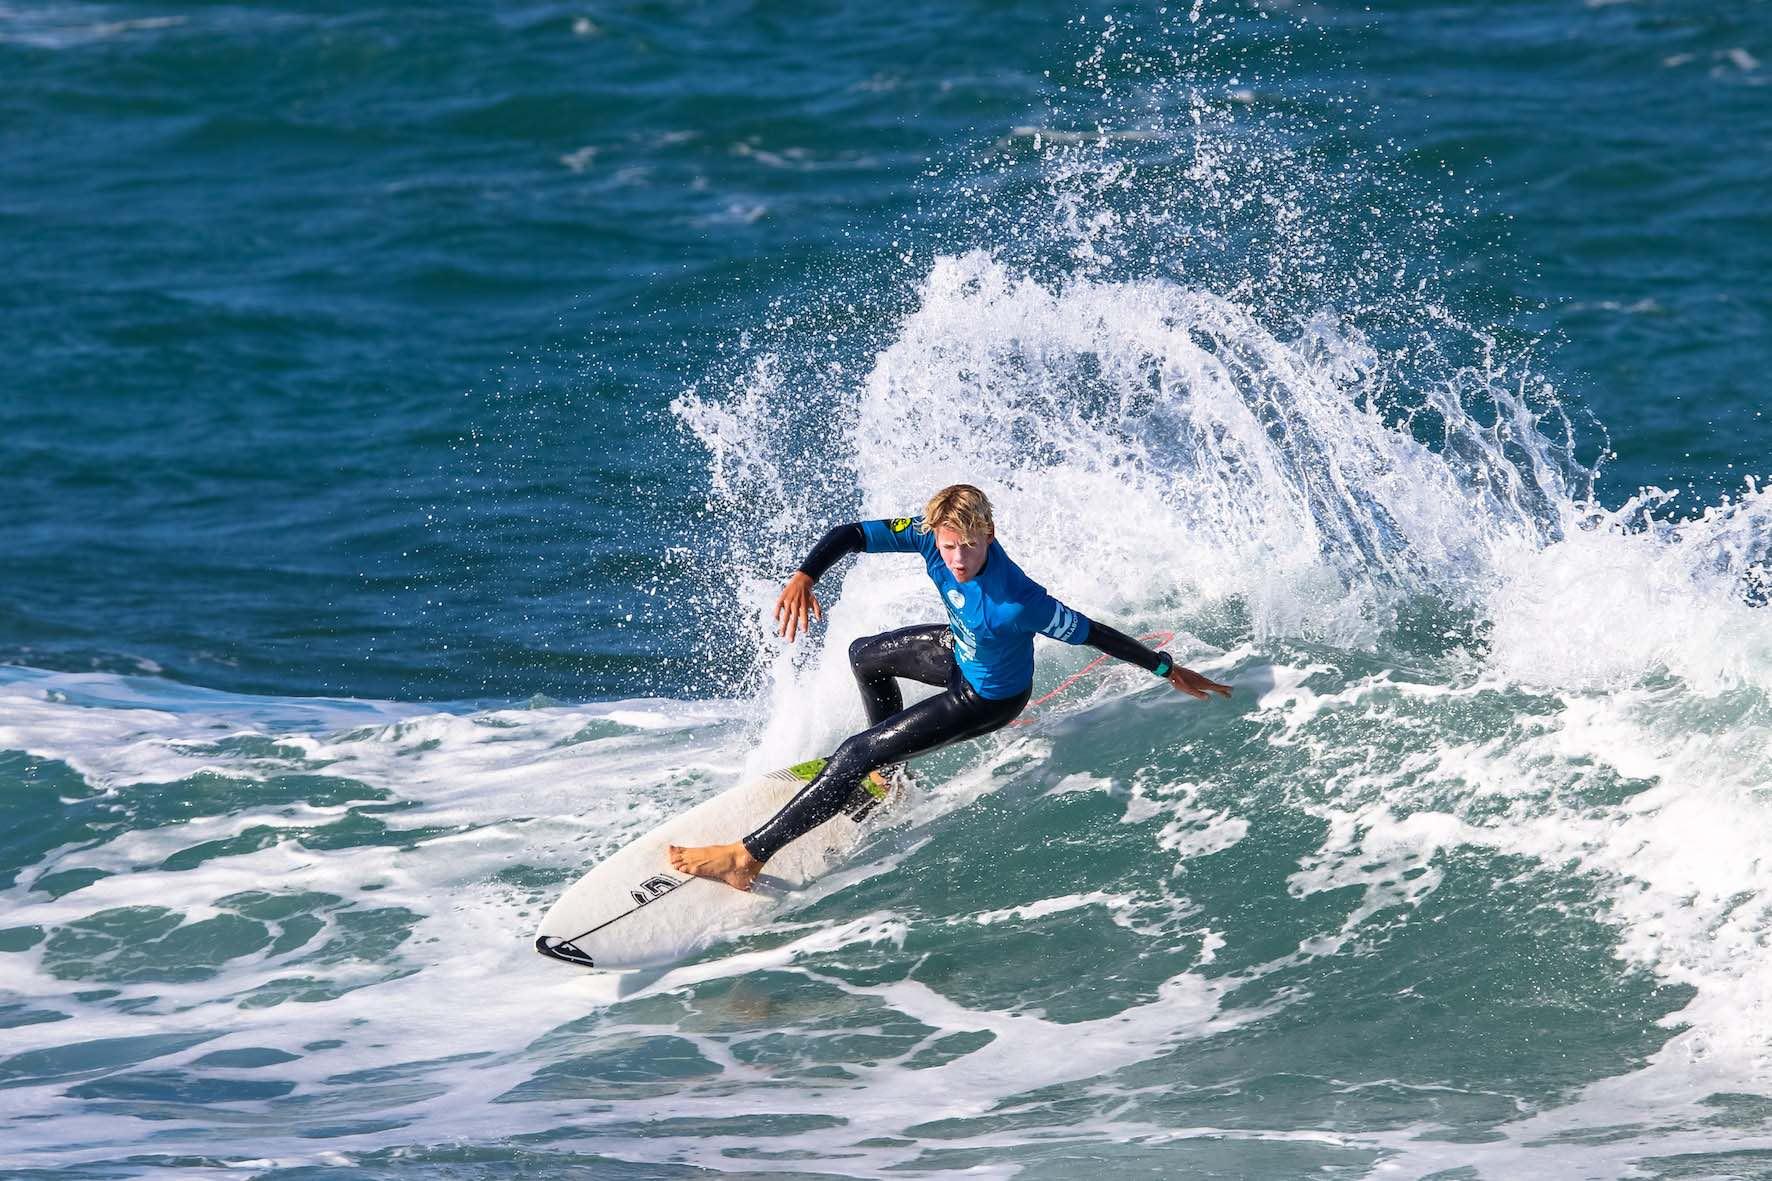 Luke Thompson surfing in the 2018 Billabong Junior Series finale